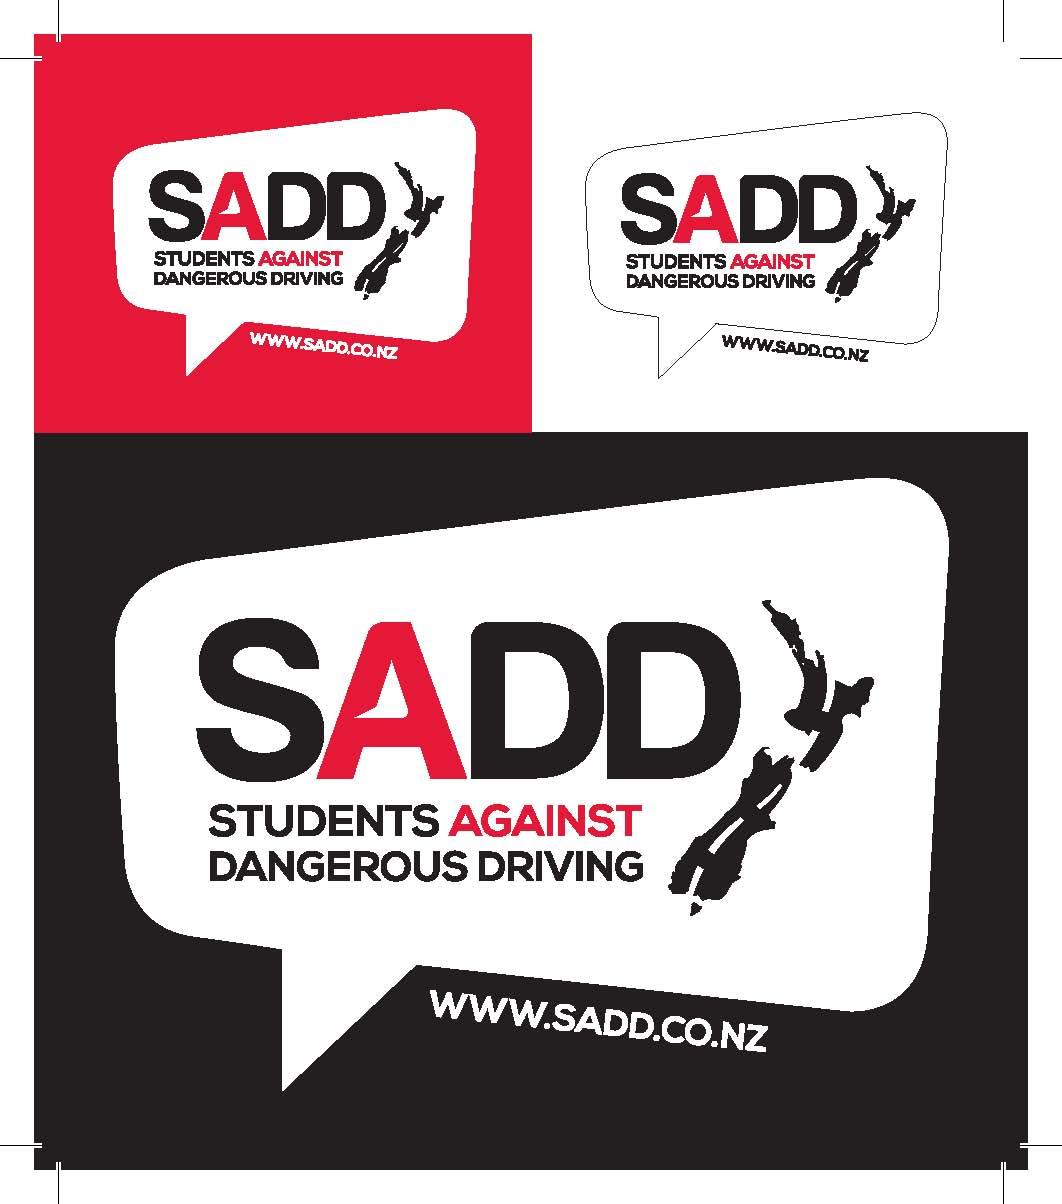 SADD-branding sticker 2014.jpg